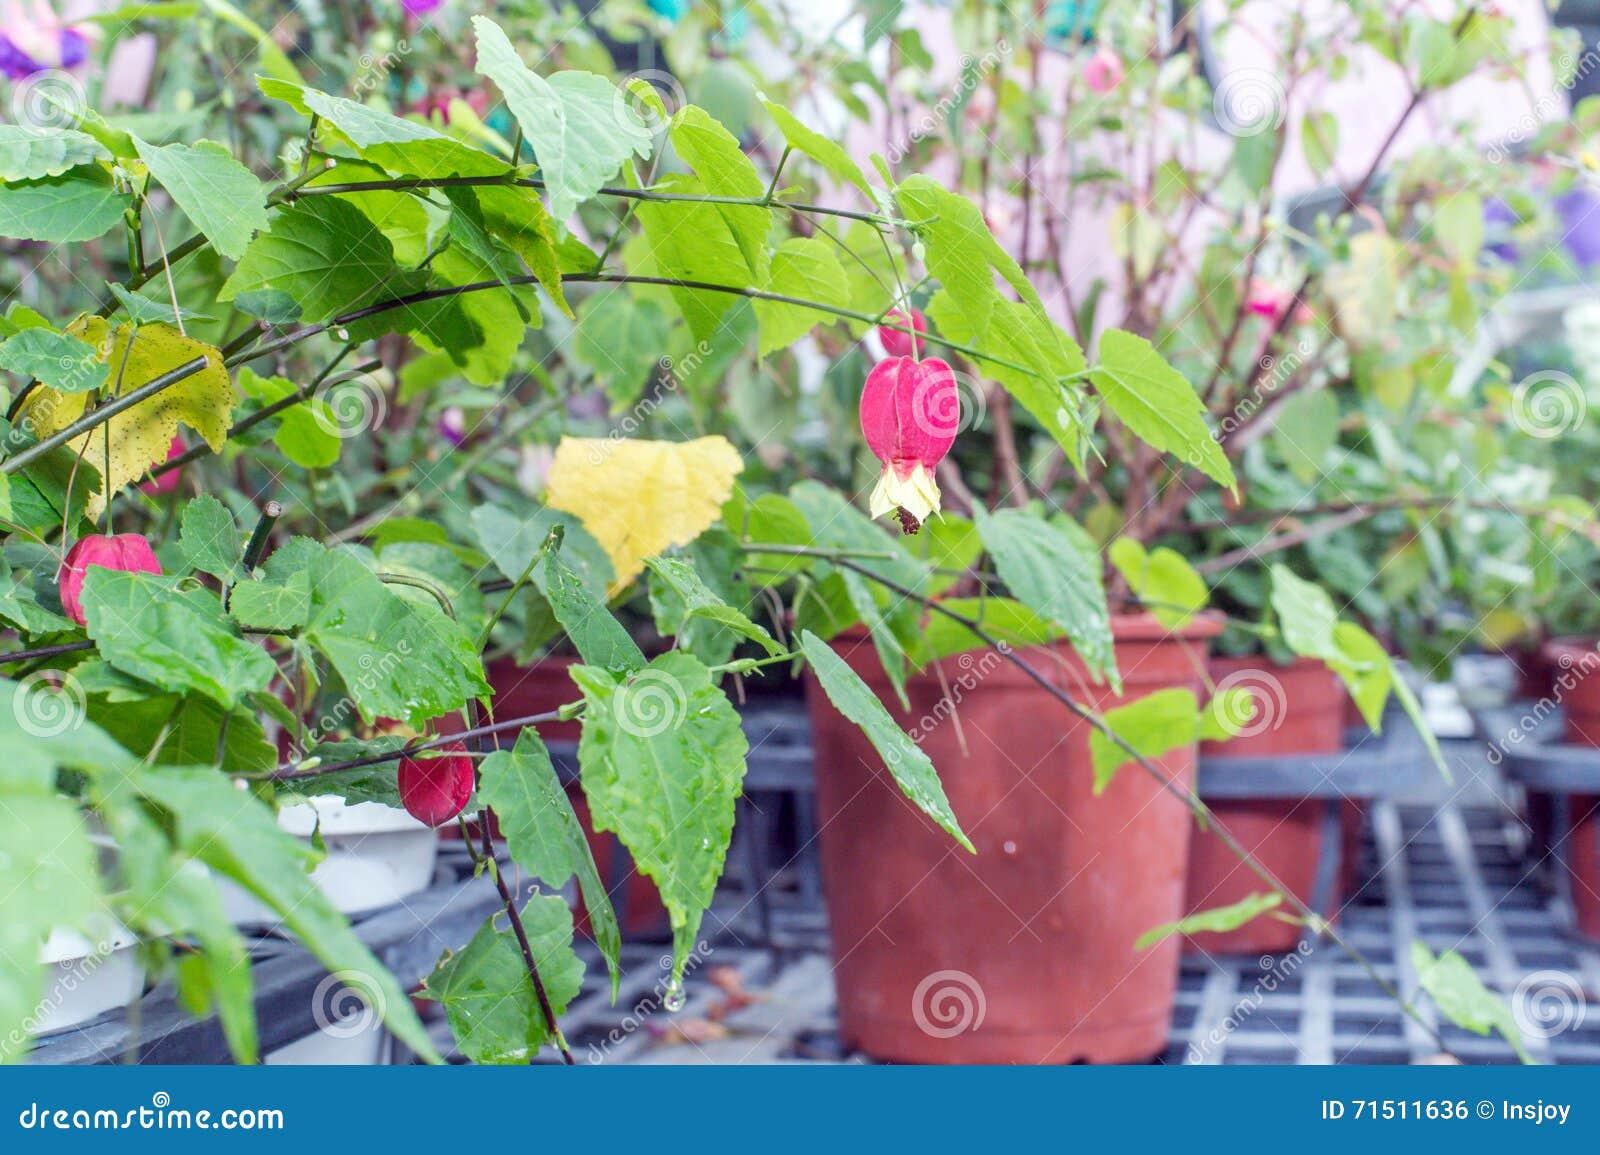 Flowering Mapletrailing Abutilonbrazilian Bell Flower Stock